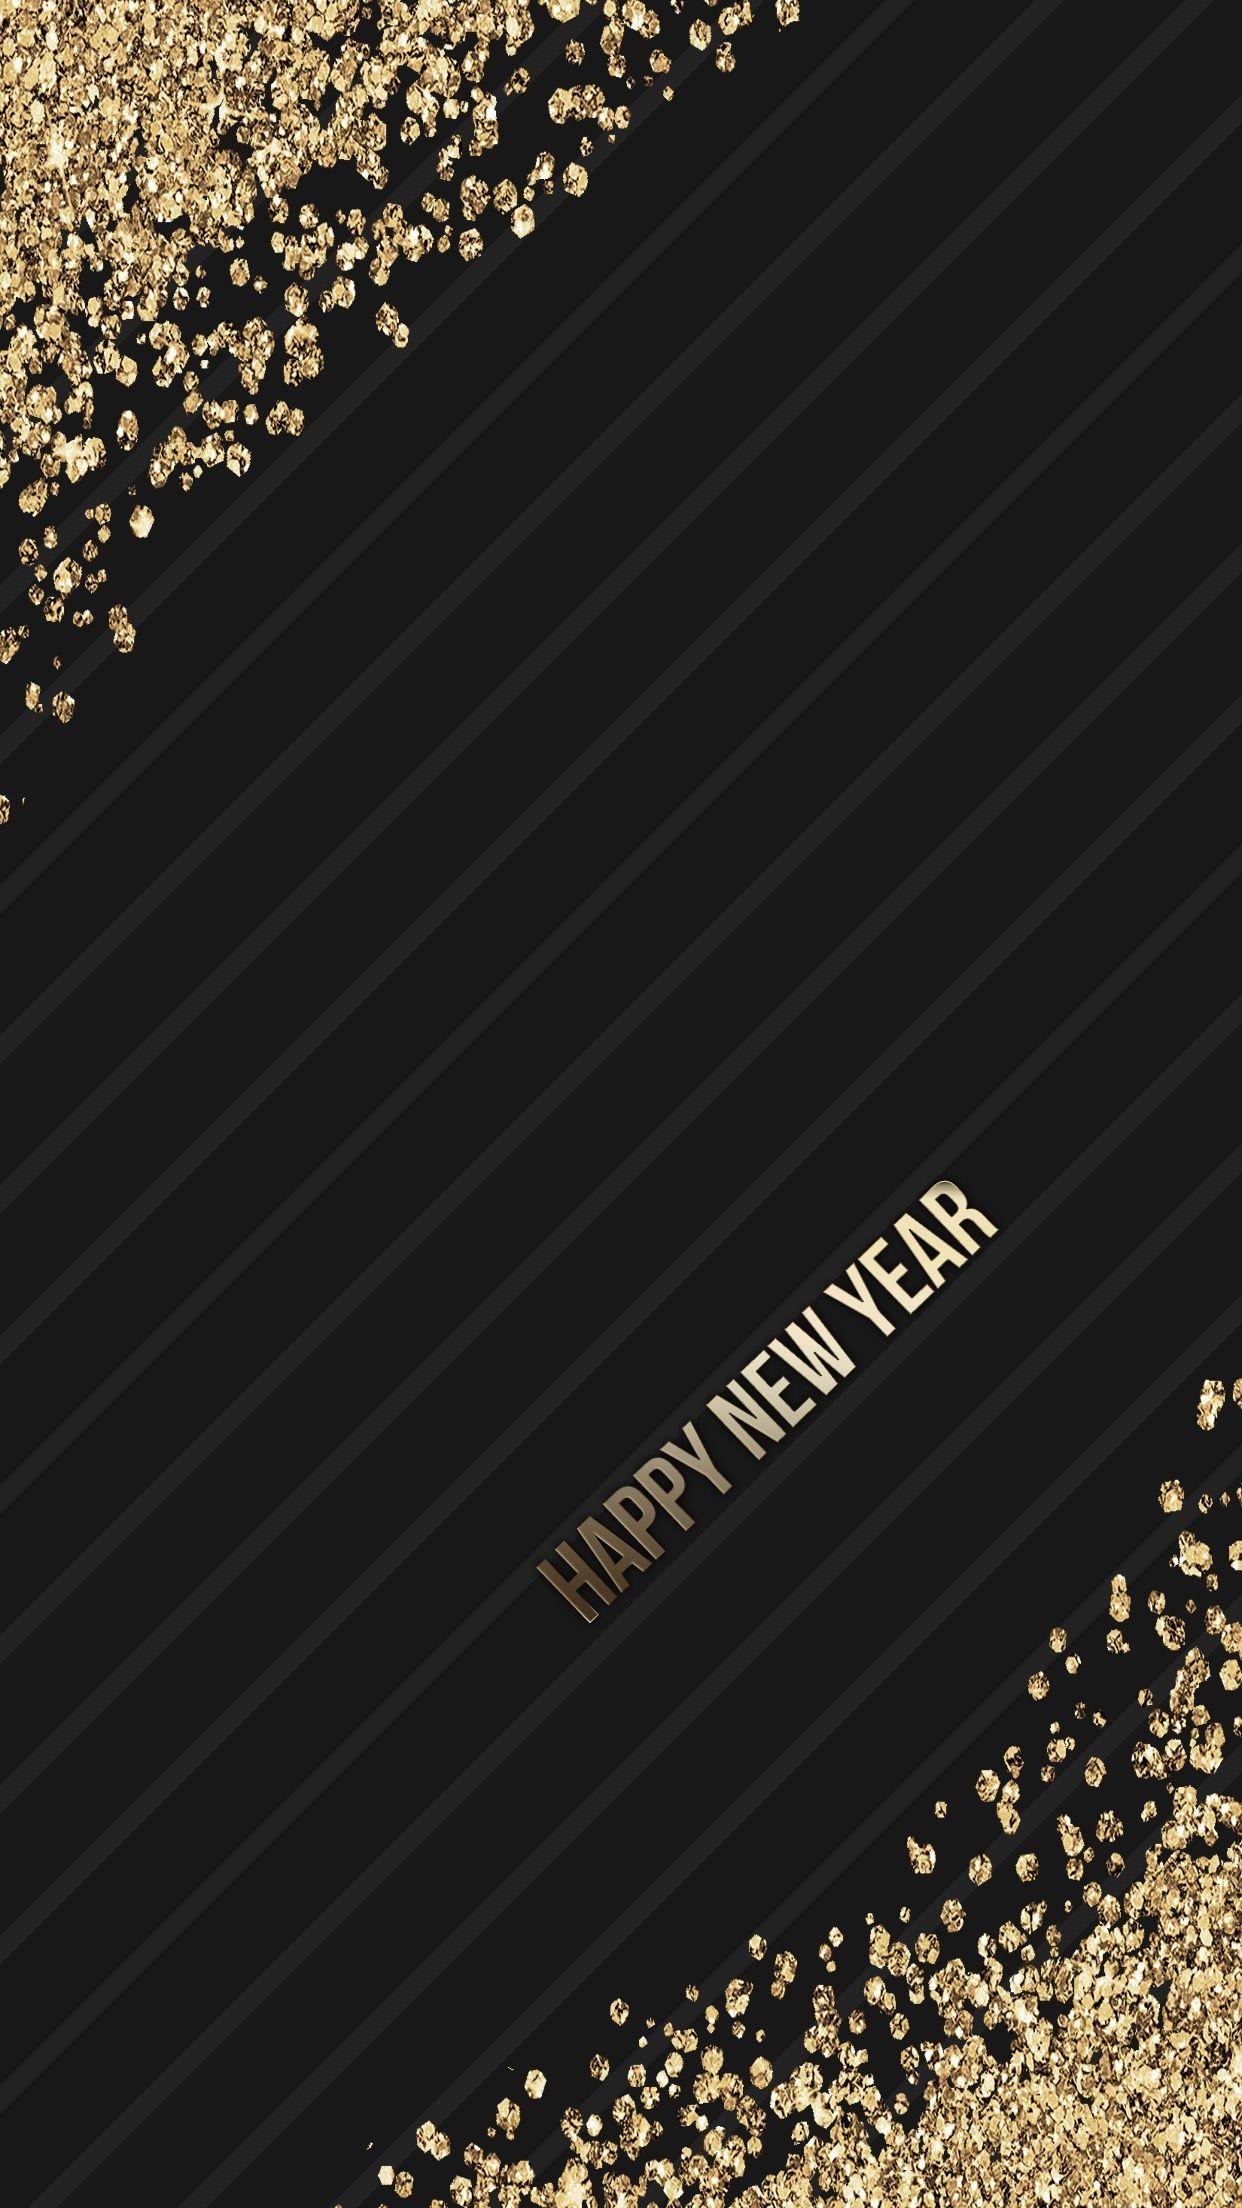 black, gold, glitter, wallpaper, background, iphone